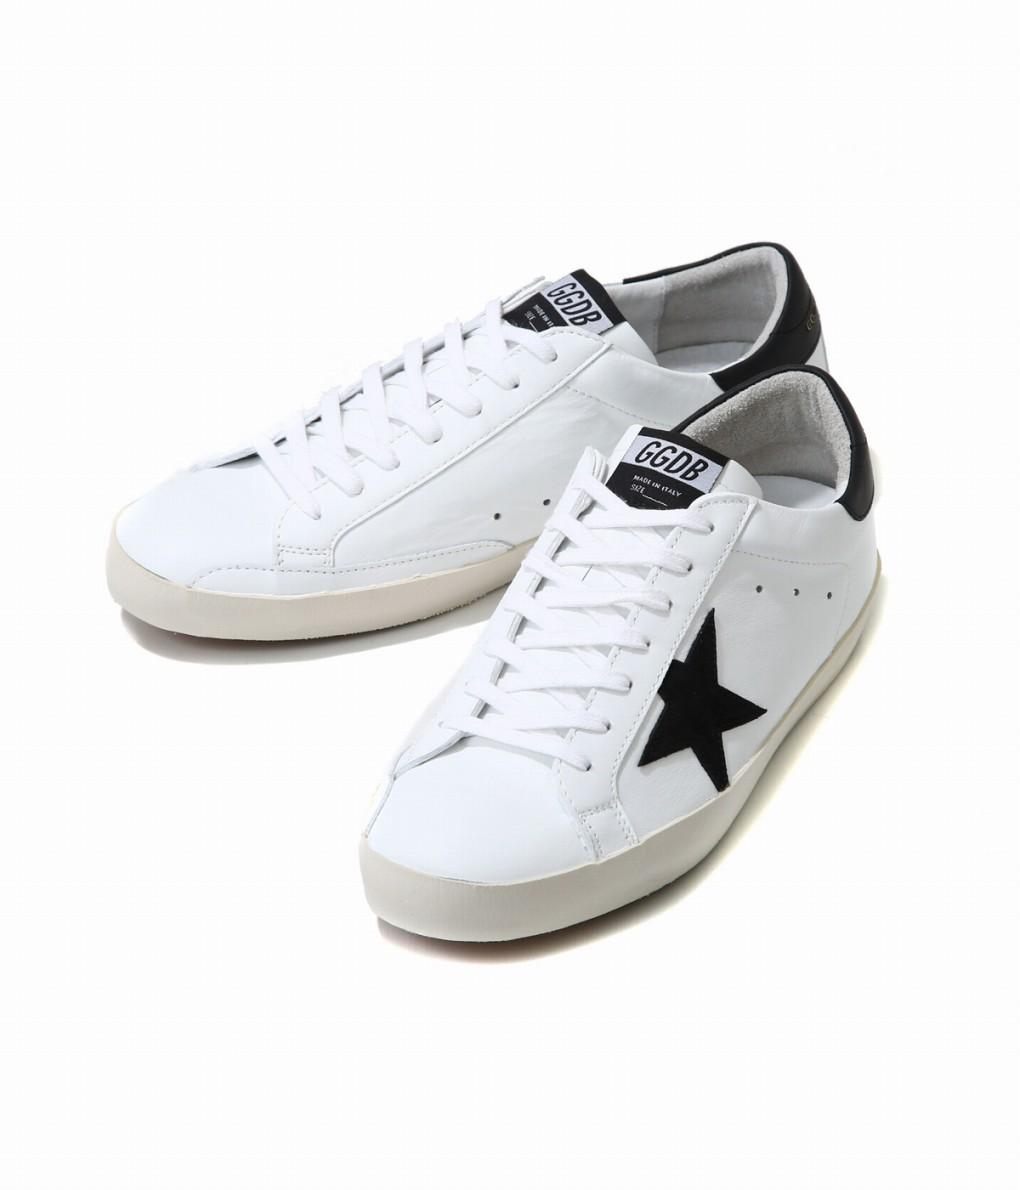 GOLDEN GOOSE / ゴールデングース : SNEAKERS SUPERSTAR -WHITE-BLACK-GOLD- : ゴールデングース スニーカー 靴 レザー 本革 ヴィンテージ加工 フランシー メンズ : G34MS590-N30【RIP】